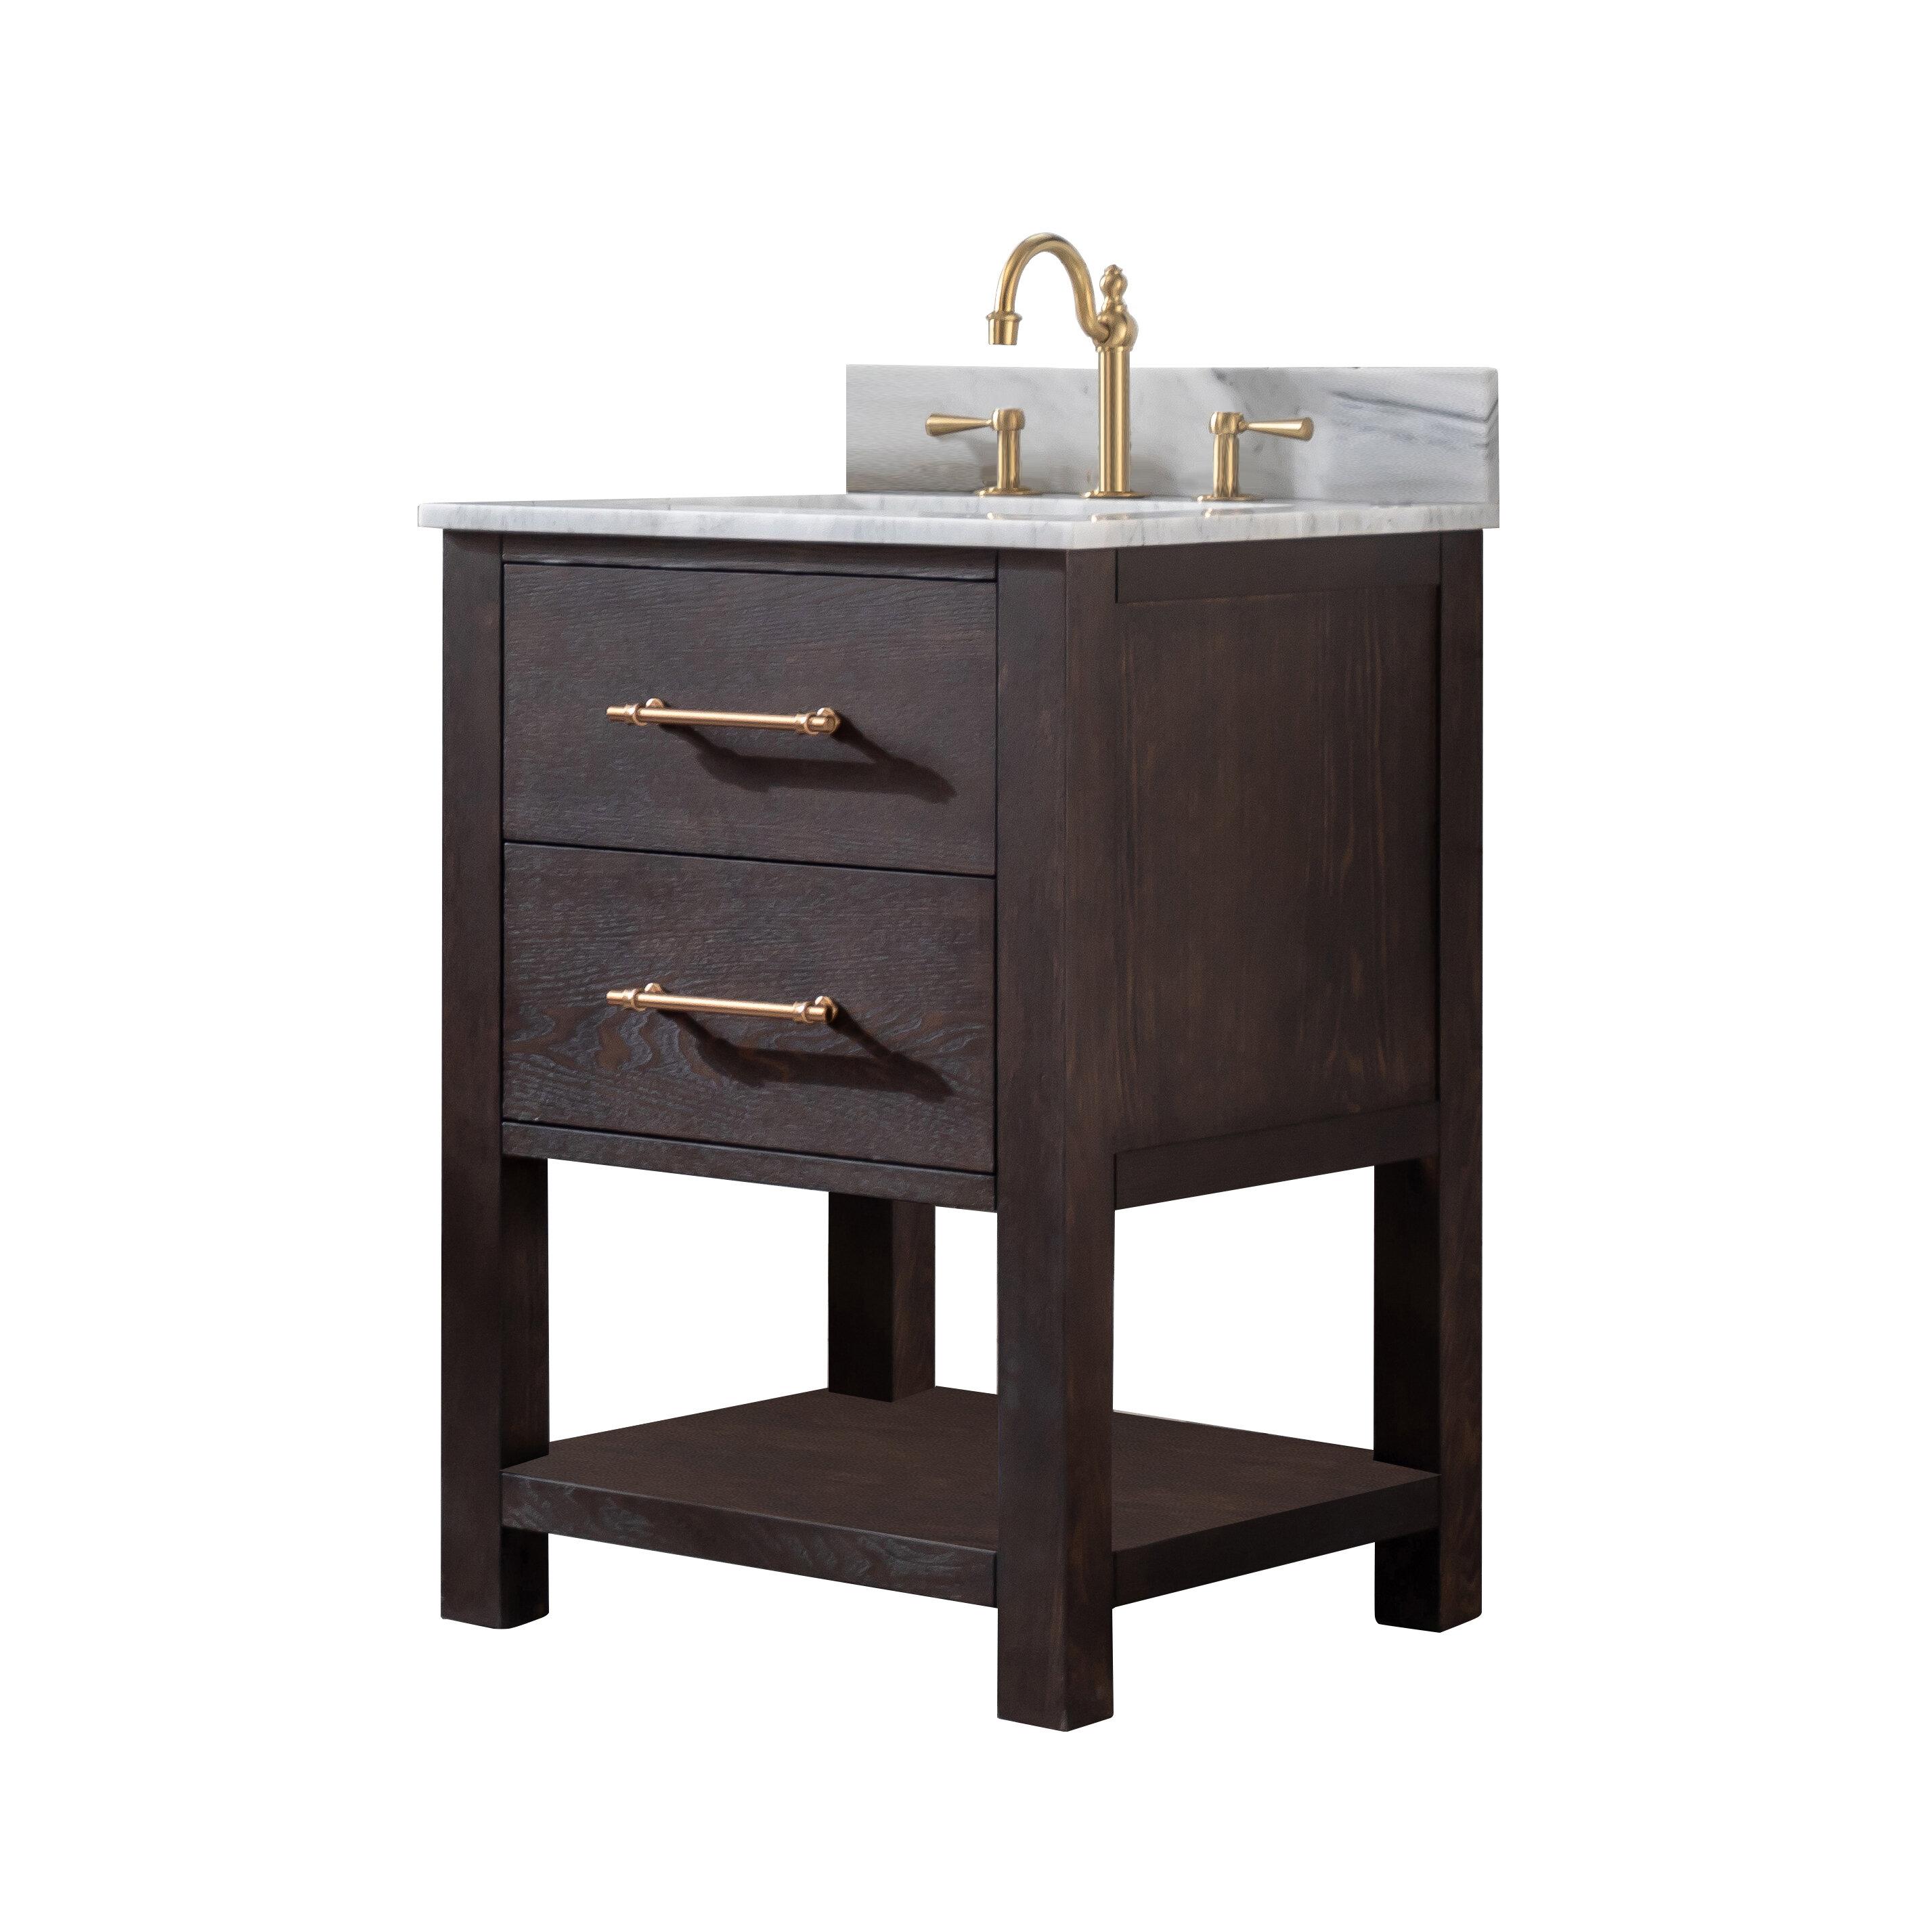 Burchette Fouke 24 Single Bathroom Vanity Set Reviews Birch Lane